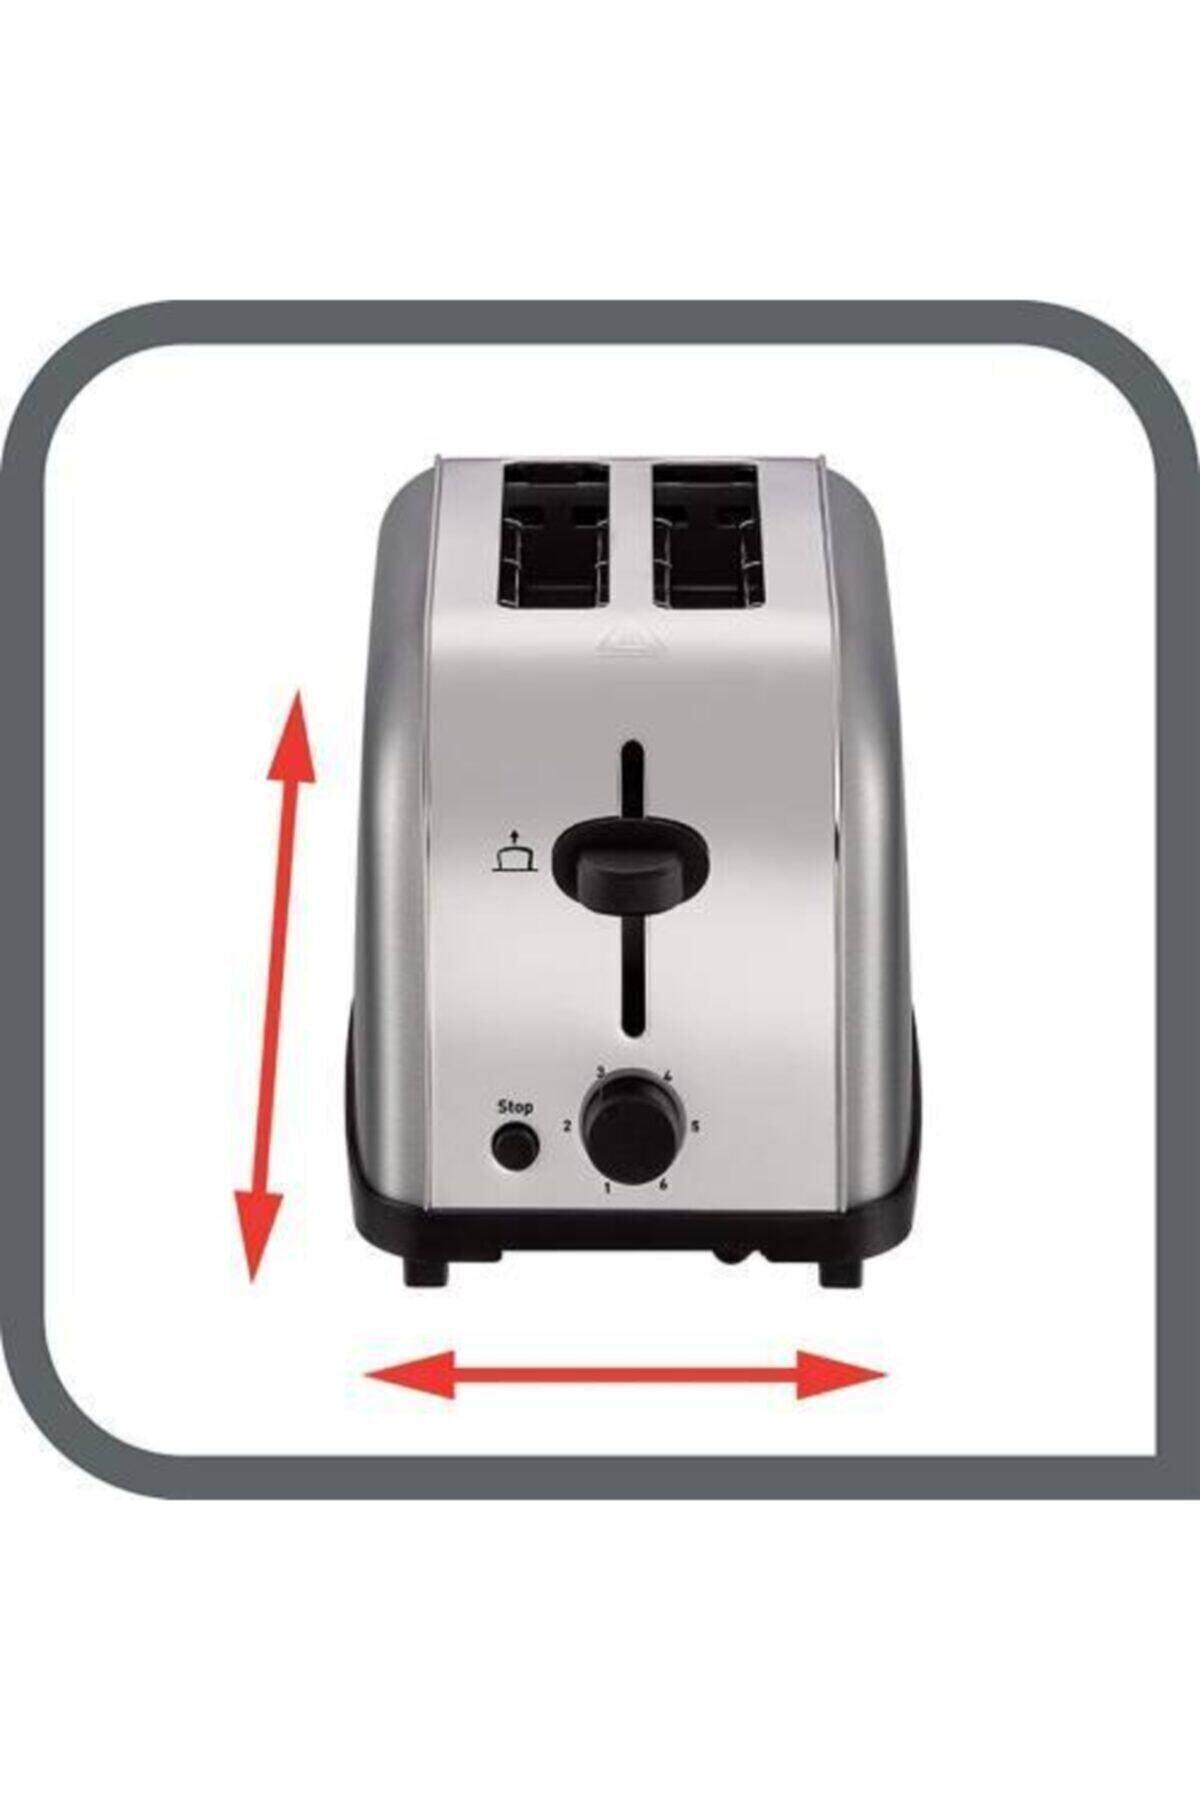 TEFAL Ultra Mini Ekmek Kızartma Makinesi (Inox) 2